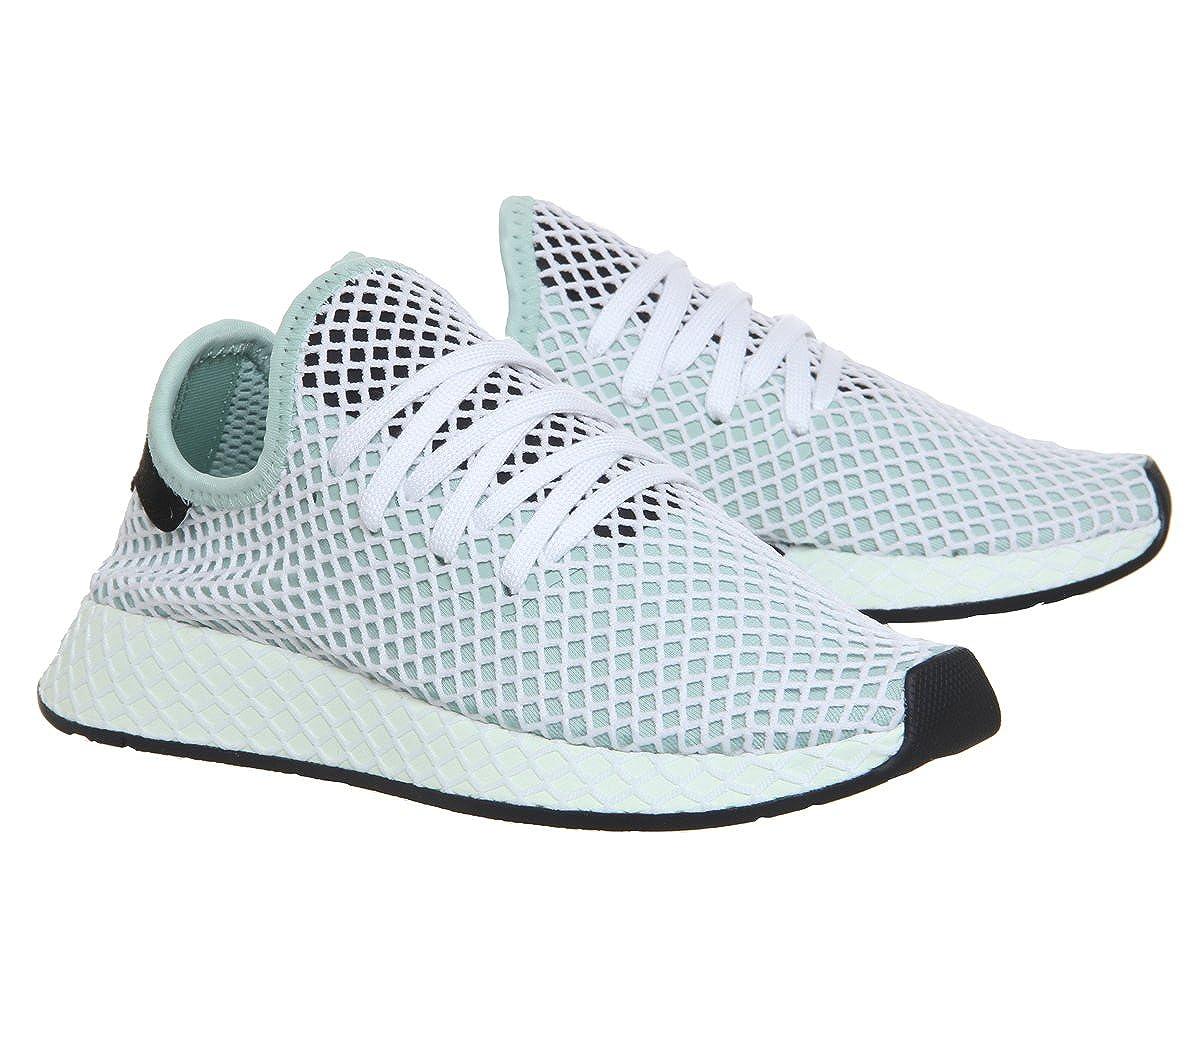 Adidas Originals Schuhgröße Turnschuhe DEERUPT Runner W CQ2911 Mint Schuhgröße Originals 39 1 3 238dc1